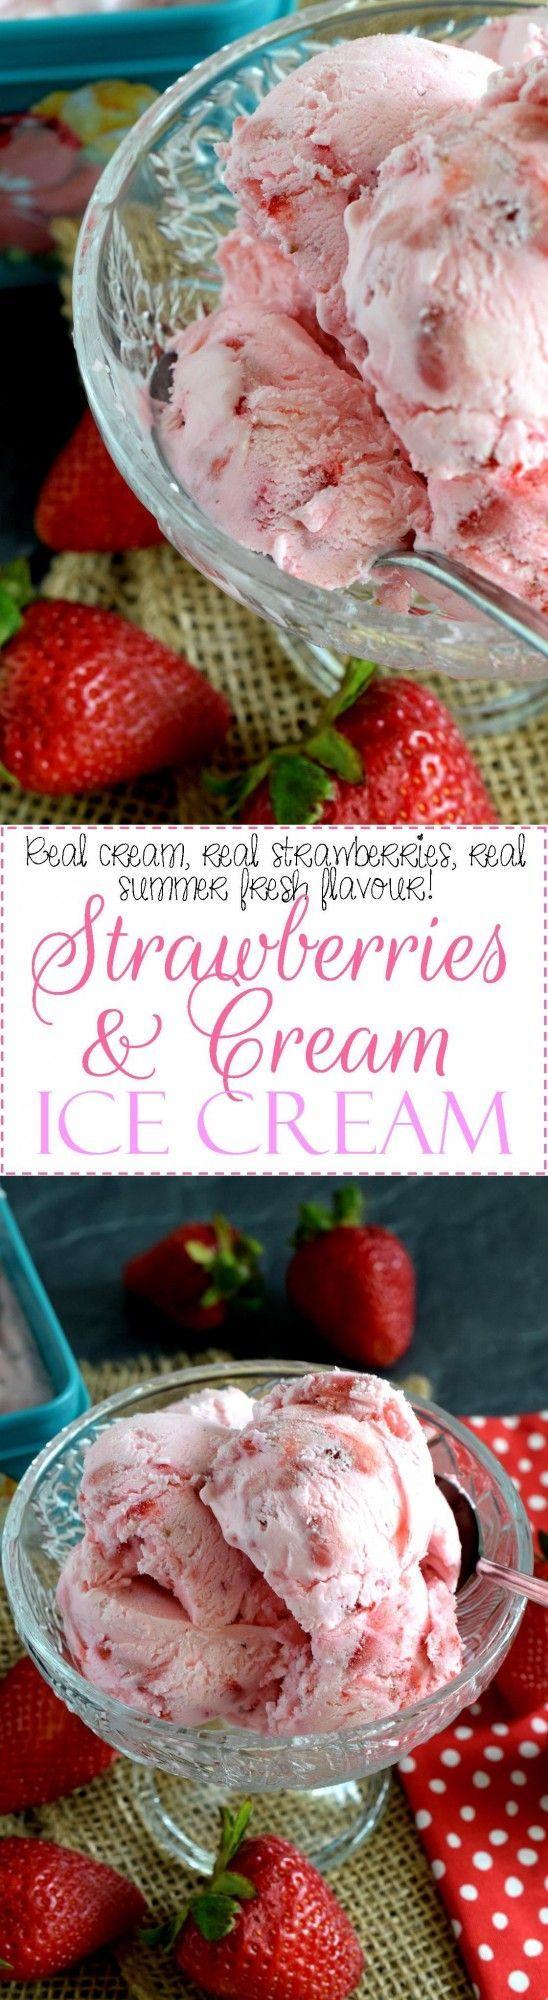 For The Intense And Dedicated Strawberry Enthusiast 8211 Strawberries And Cream No Ch Frozen Yogurt Recipes Homemade Strawberry Ice Cream Homemade Ice Cream